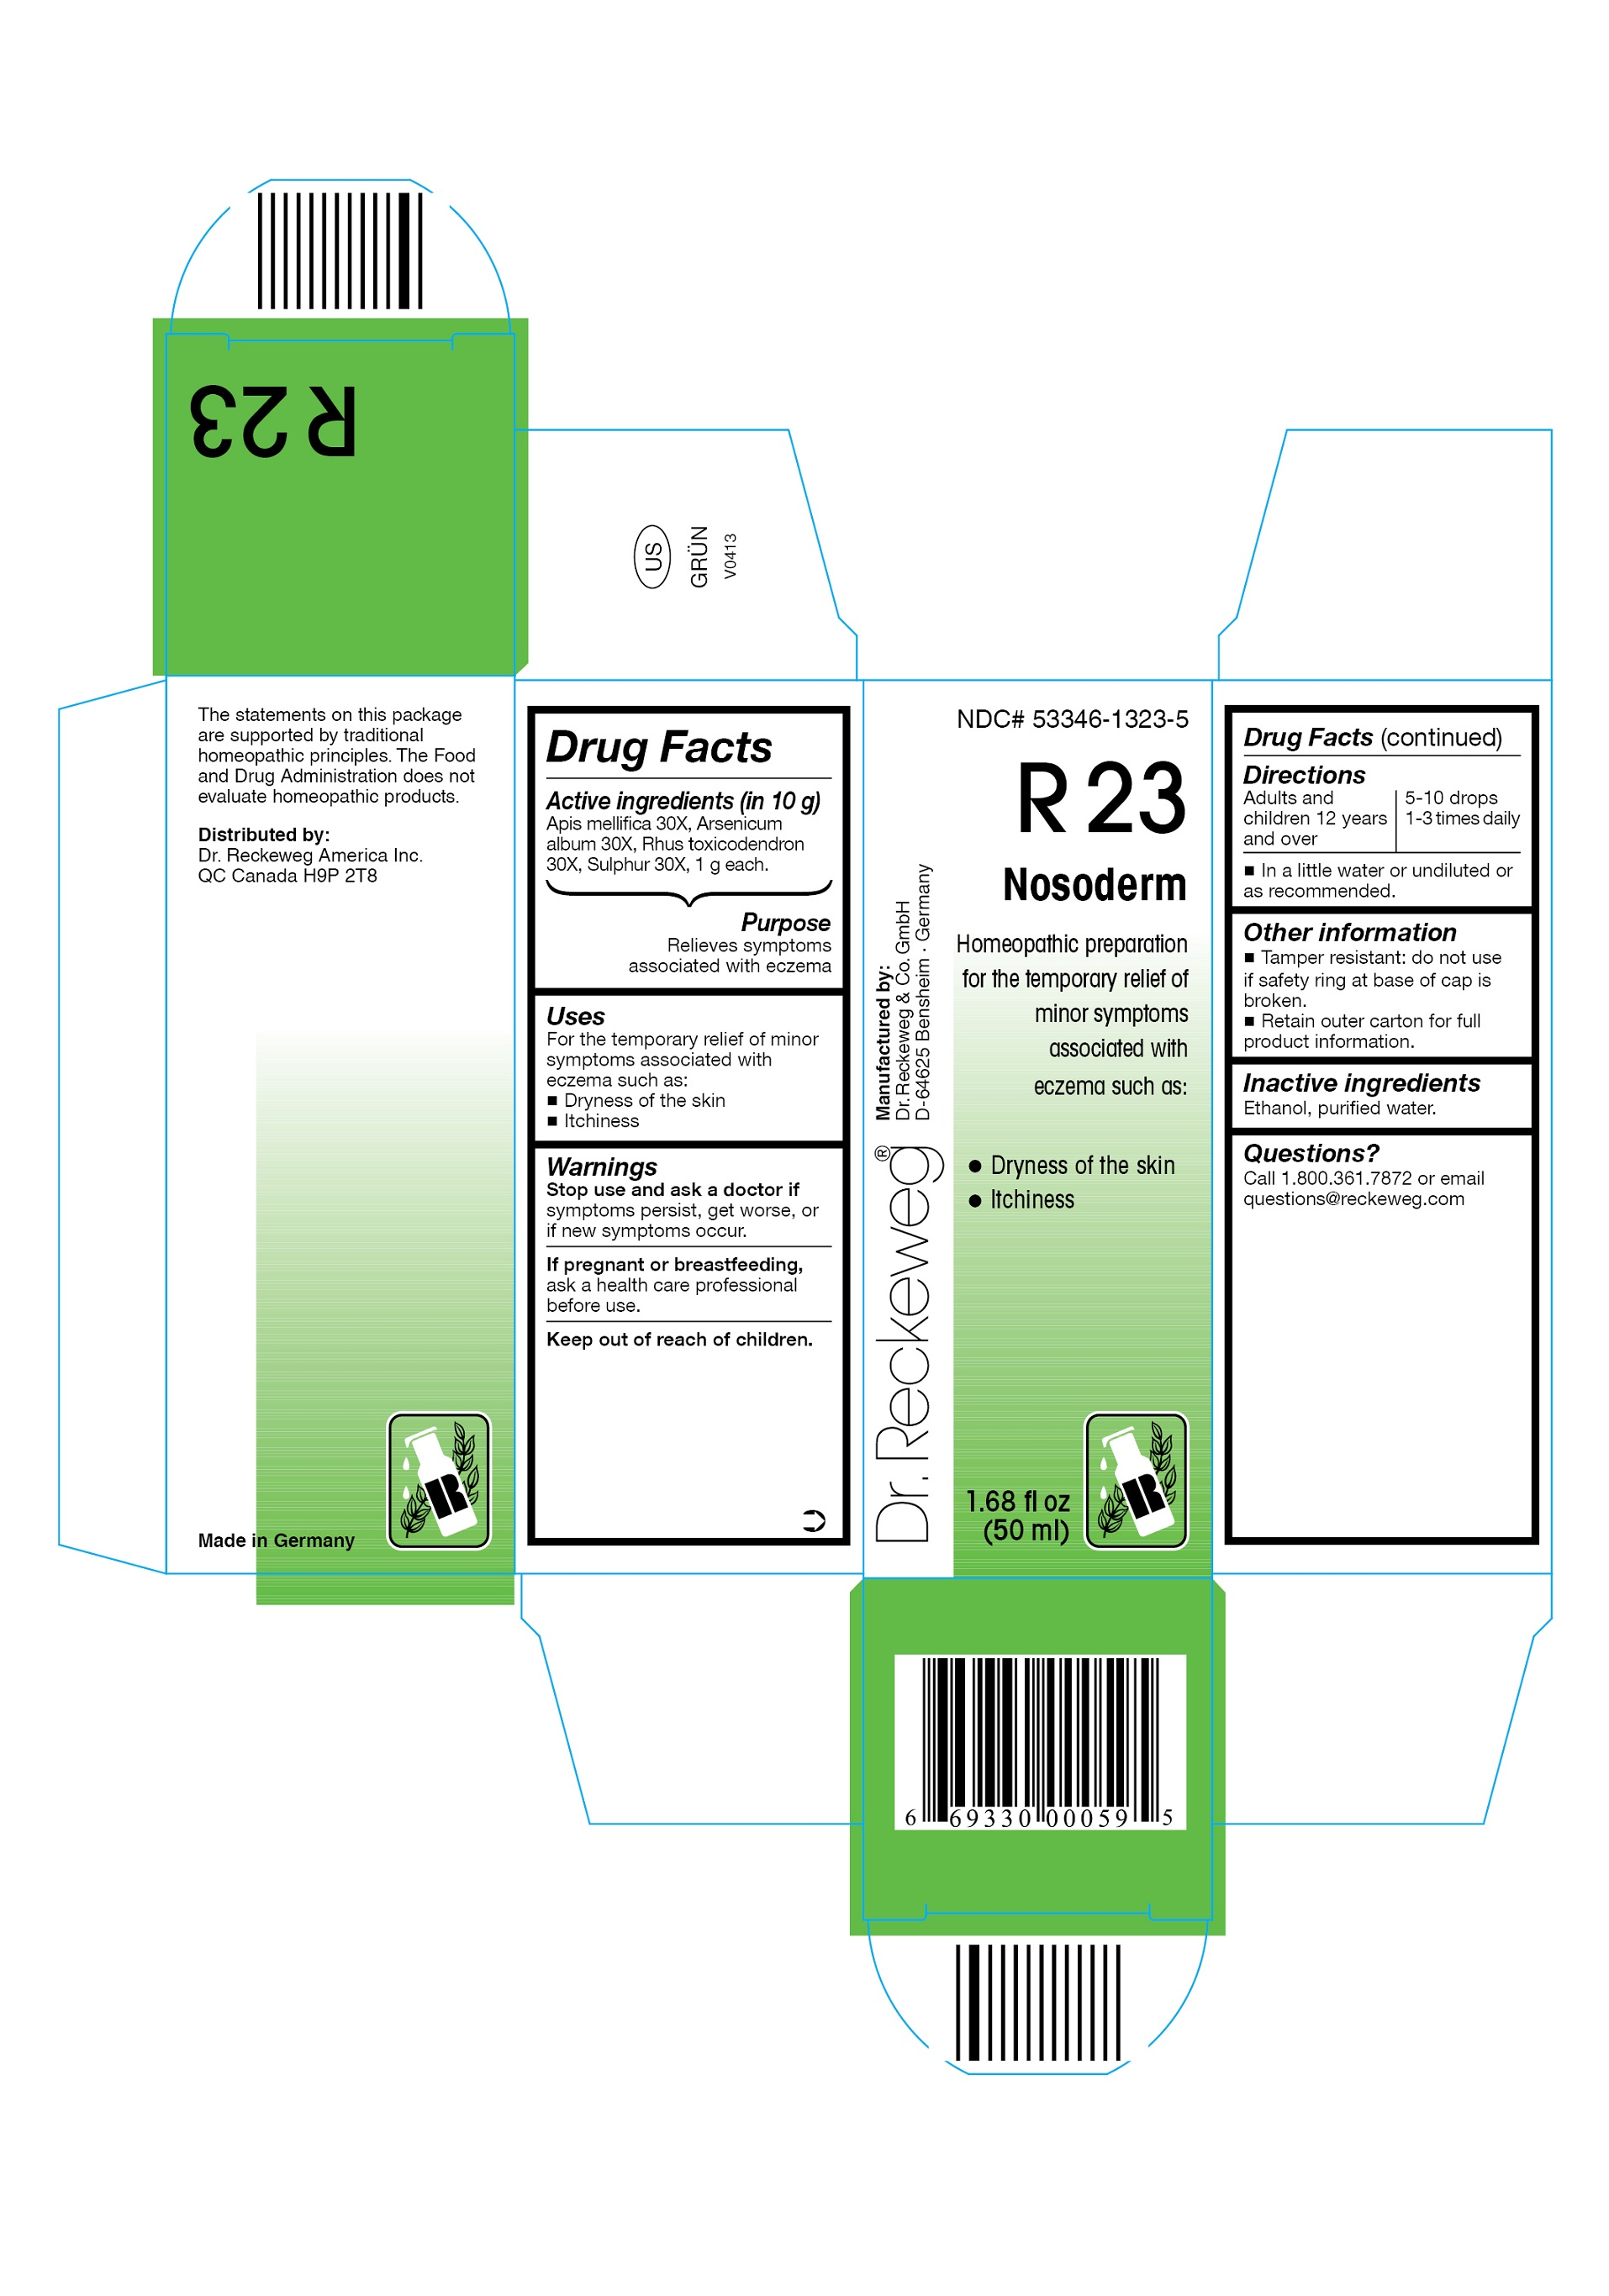 Dr. Reckeweg R23 Nosoderm Combination Product (Apis Mellifica 30x, Arsenicum Album 30x, Rhus Toxicodendron 30x, Sulphur 30x) Liquid [Pharmazeutische Fabrik Dr. Reckeweg & Co]